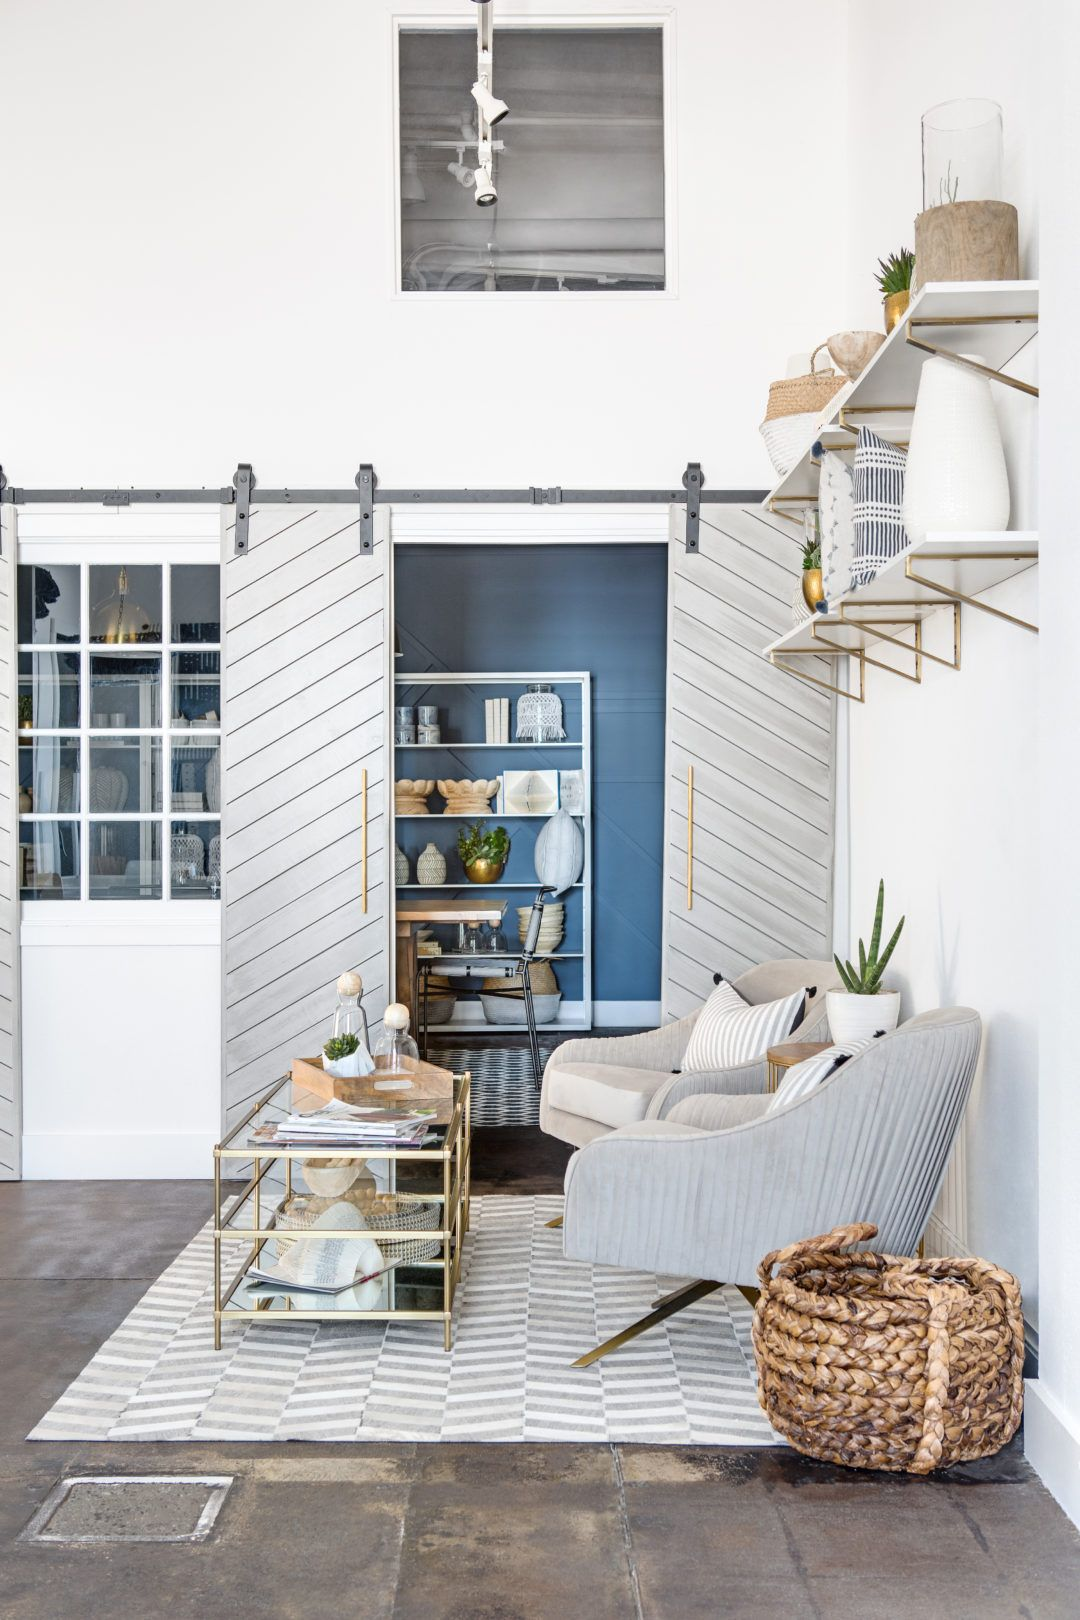 Lindye galloway studio tour offices pinterest interior design